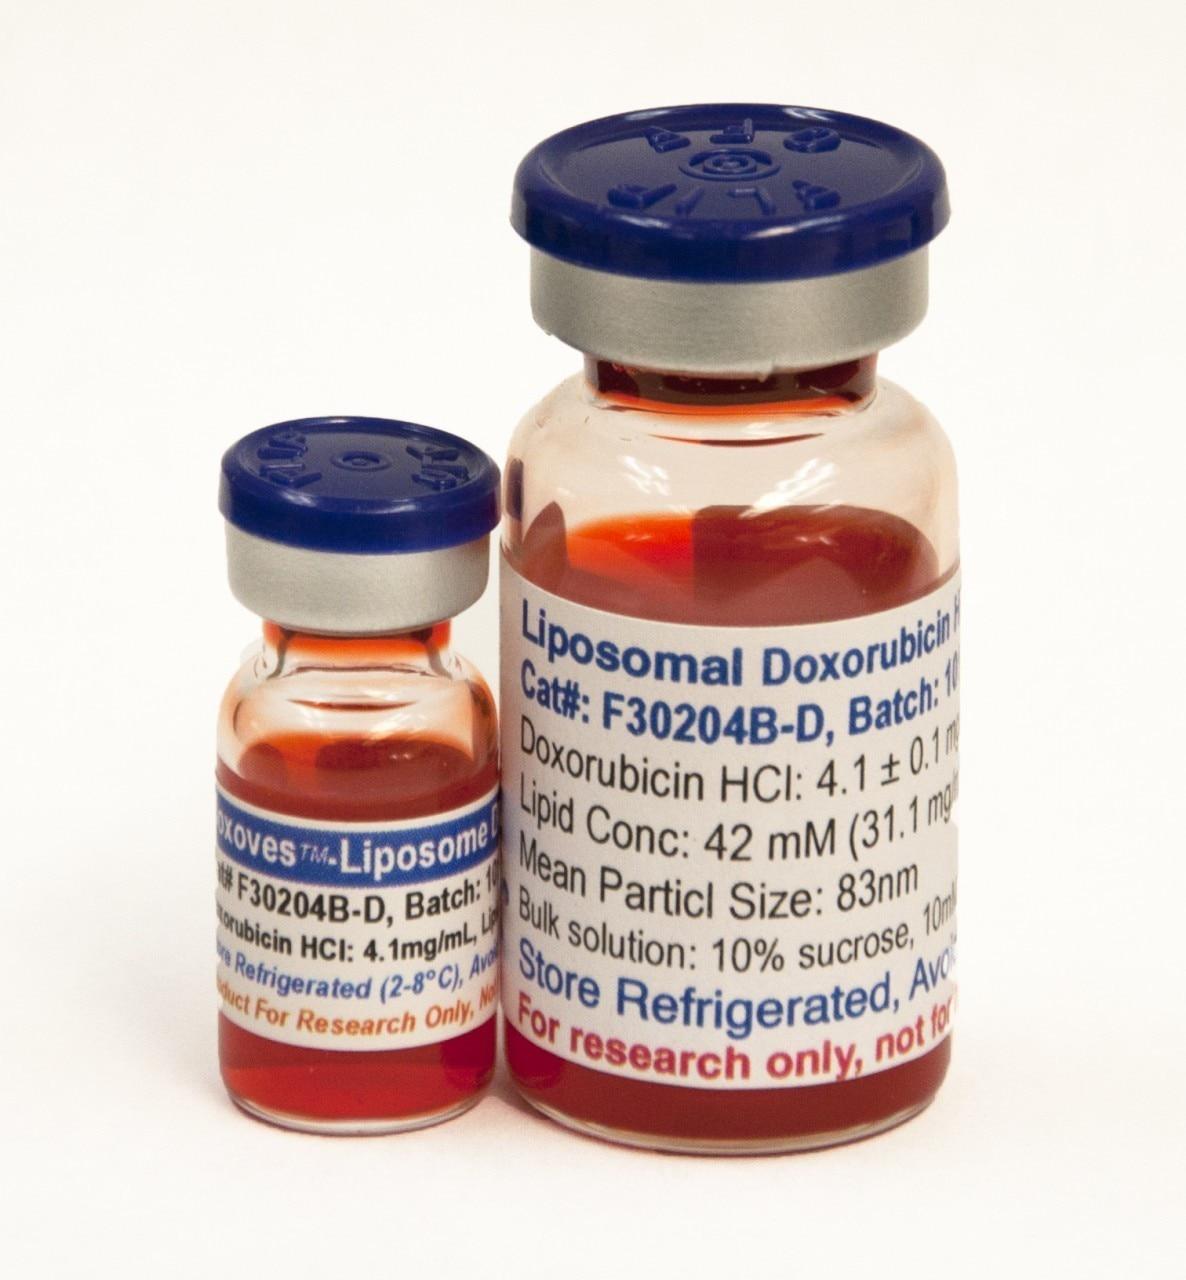 FormuMax/Combo kit of Doxoves®  (2.0mg/mL) and plain control liposomes/F30204C-D2/2 mL